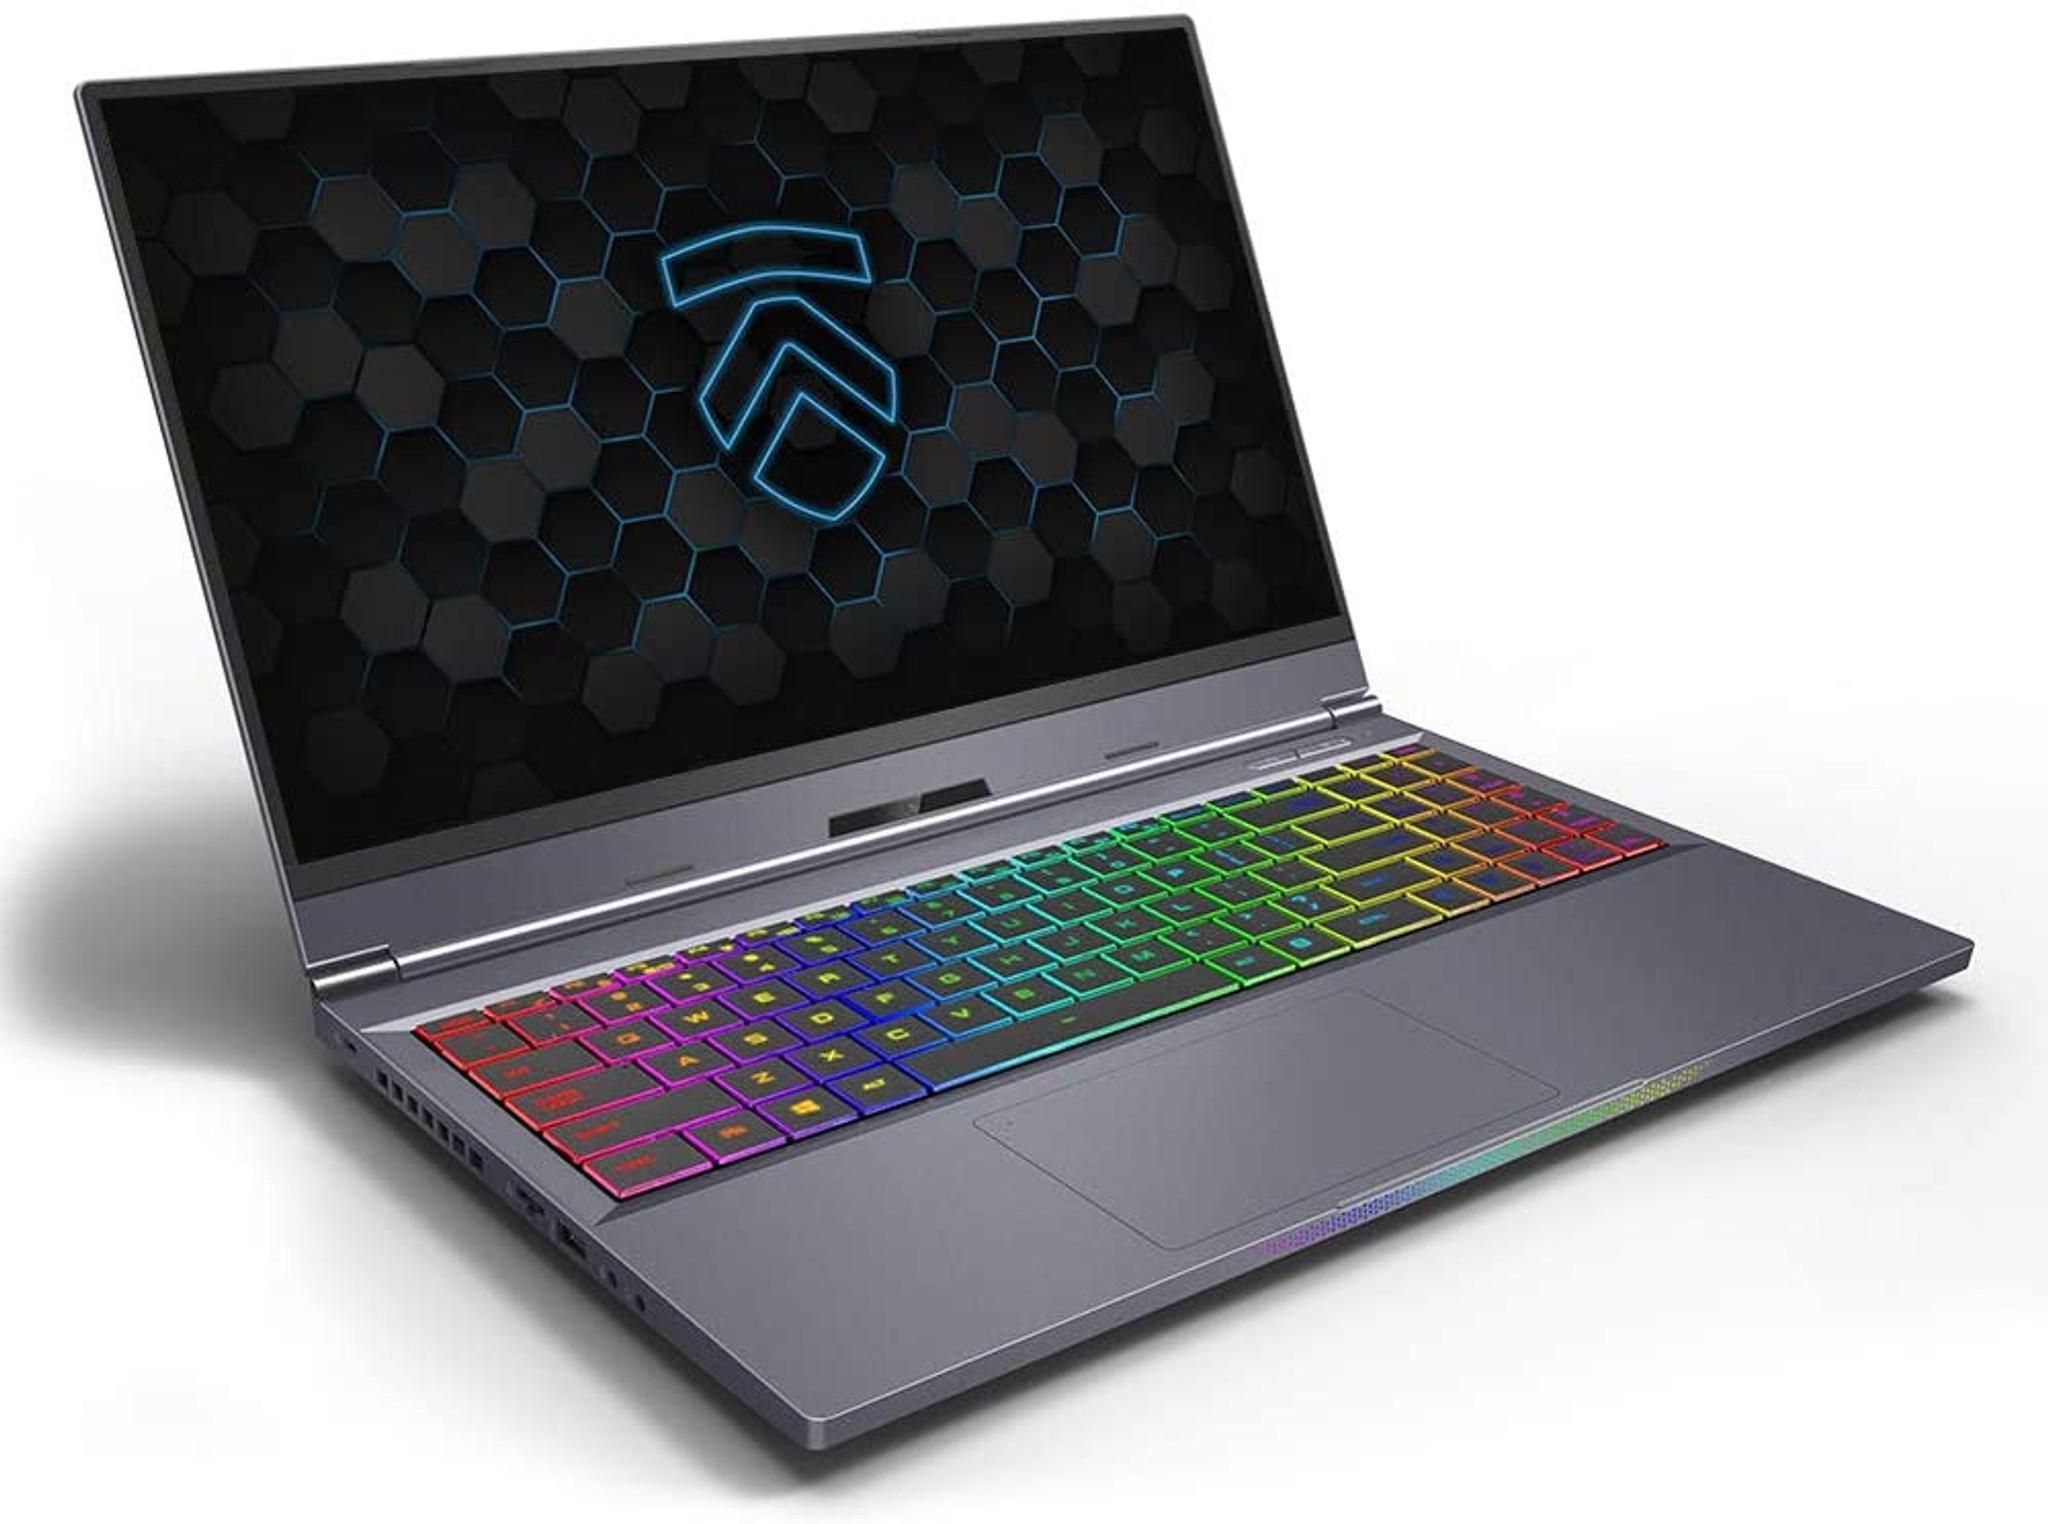 Eluktronics MAX-15 Slim & Ultra Light QHD 165Hz Gaming Laptop (1TB PCIe SSD  + 16GB RAM)